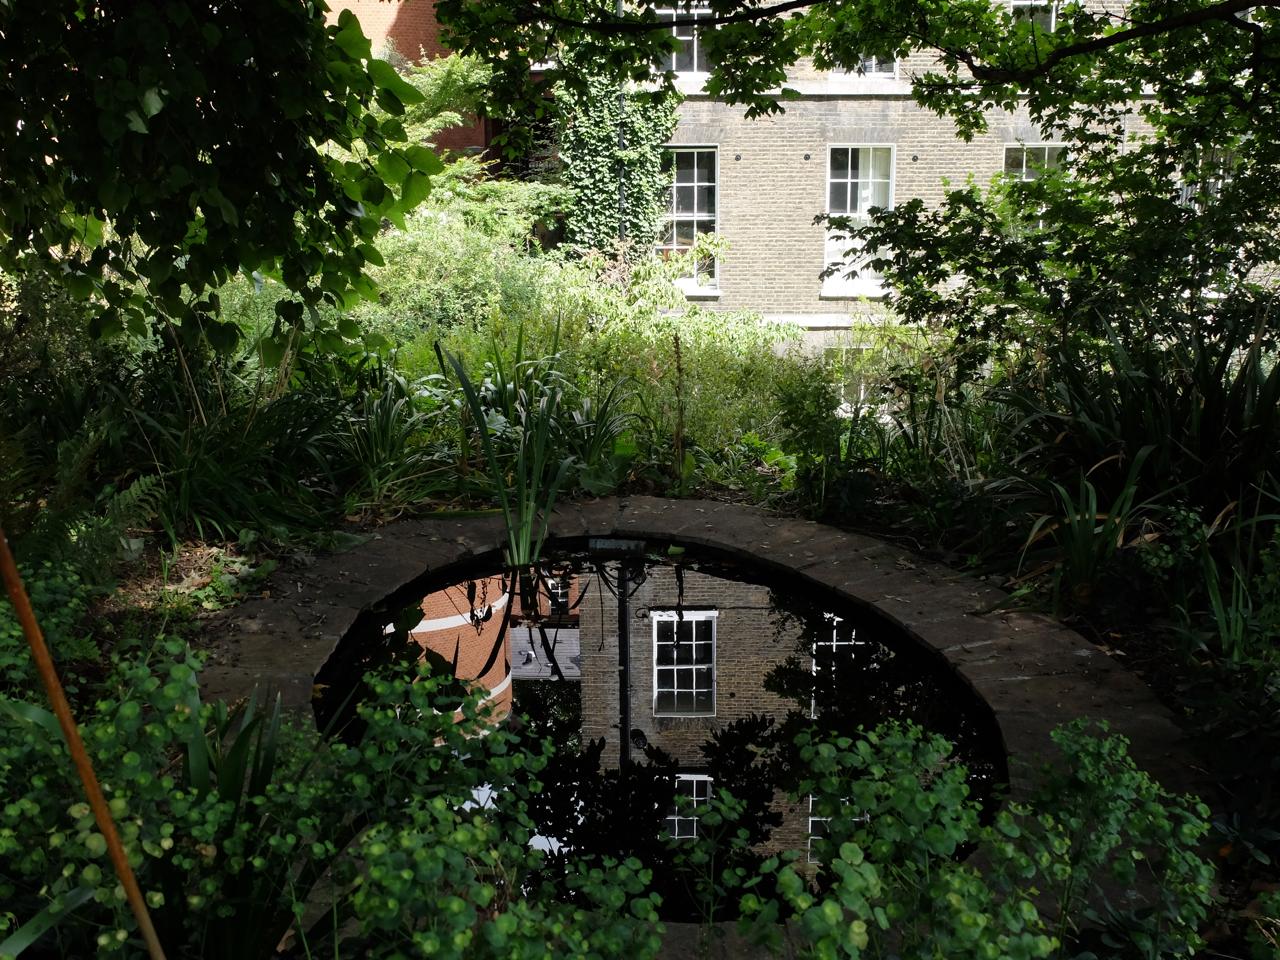 Pond and greenery in Grays Inn Walks